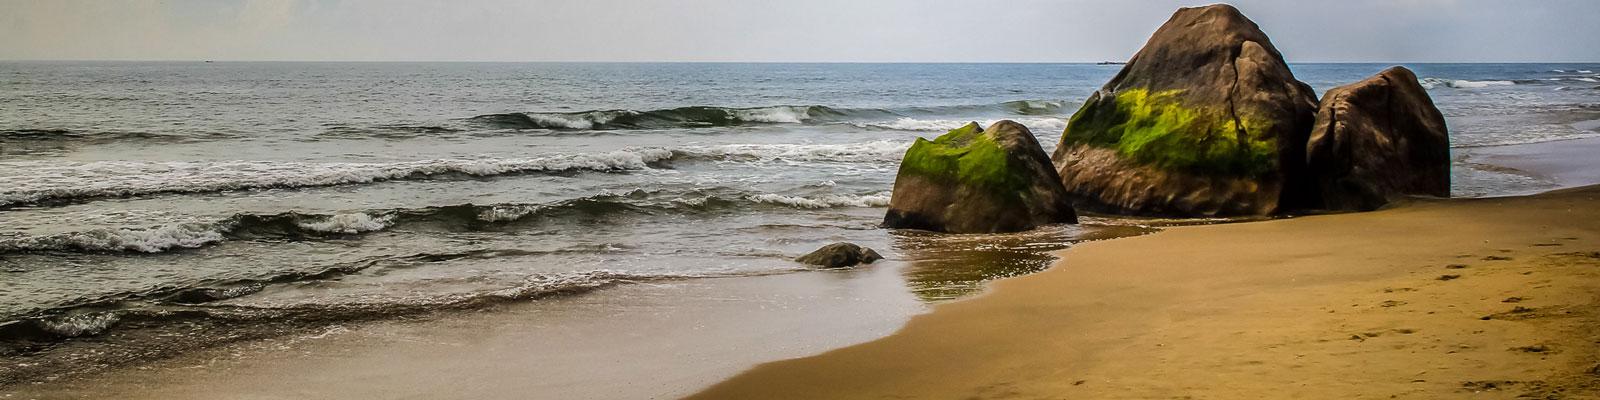 Image for tamilnadu beach